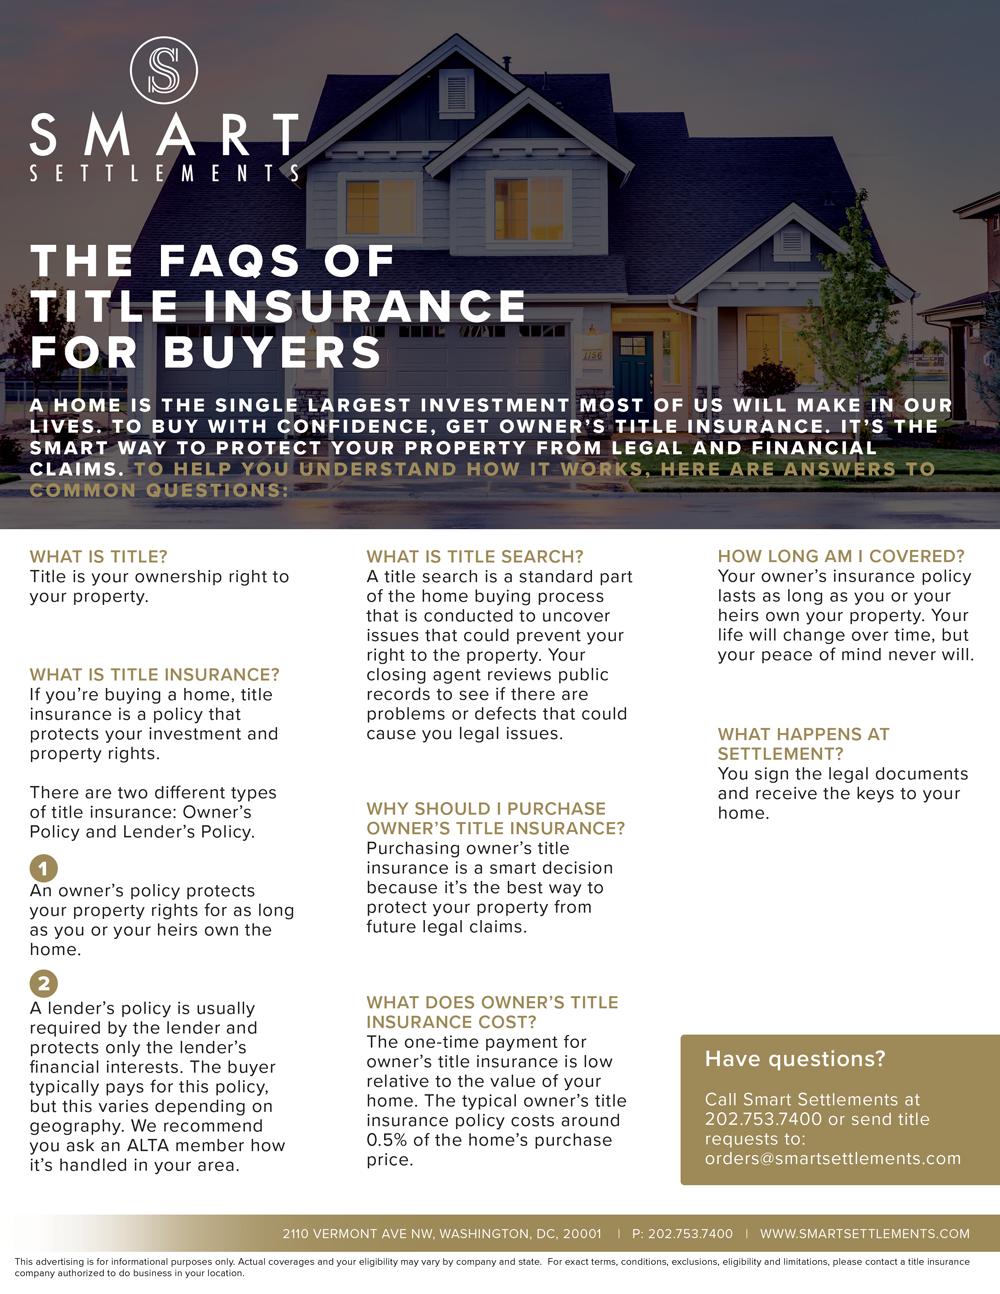 smart-settlements.title-insurance-faqs.png